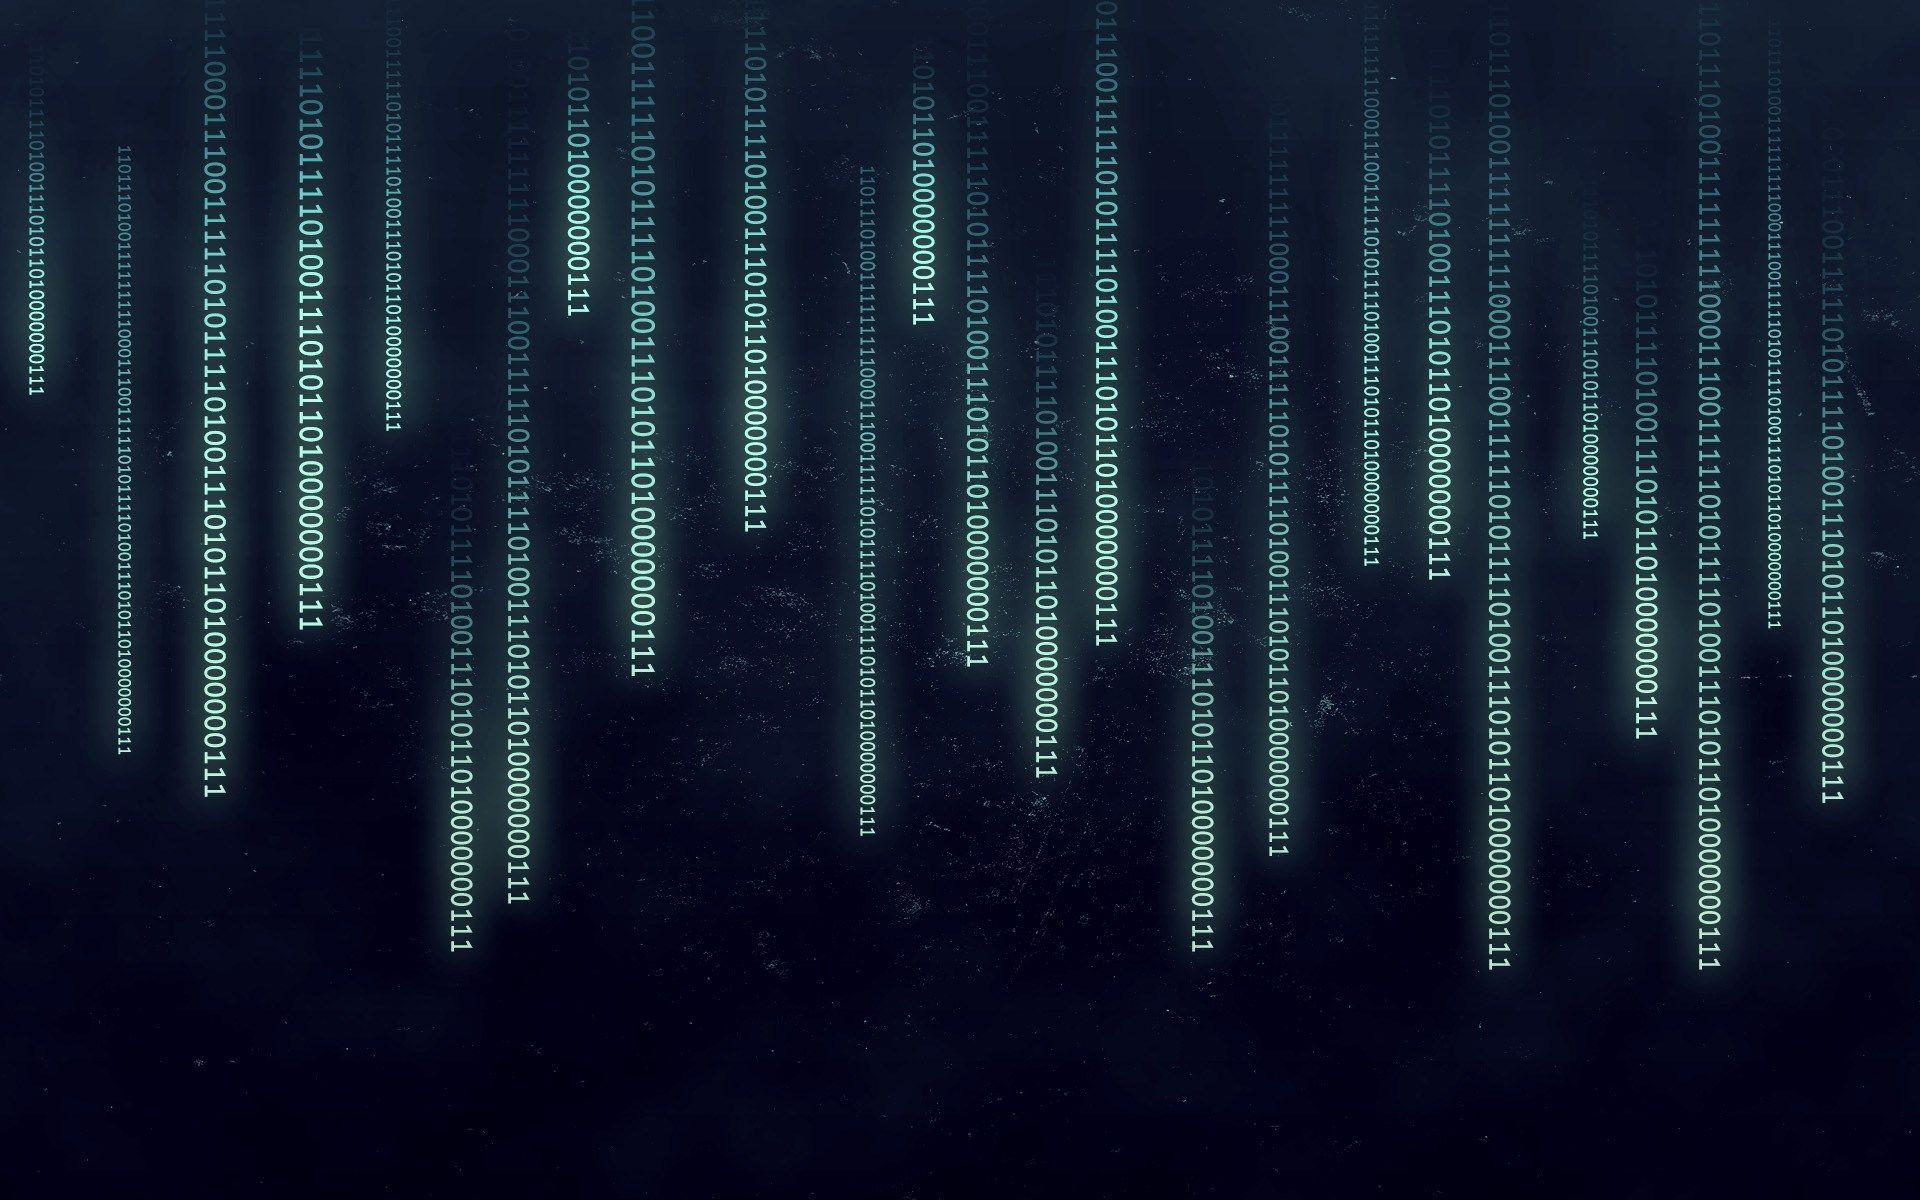 Wallpapers Free Binary